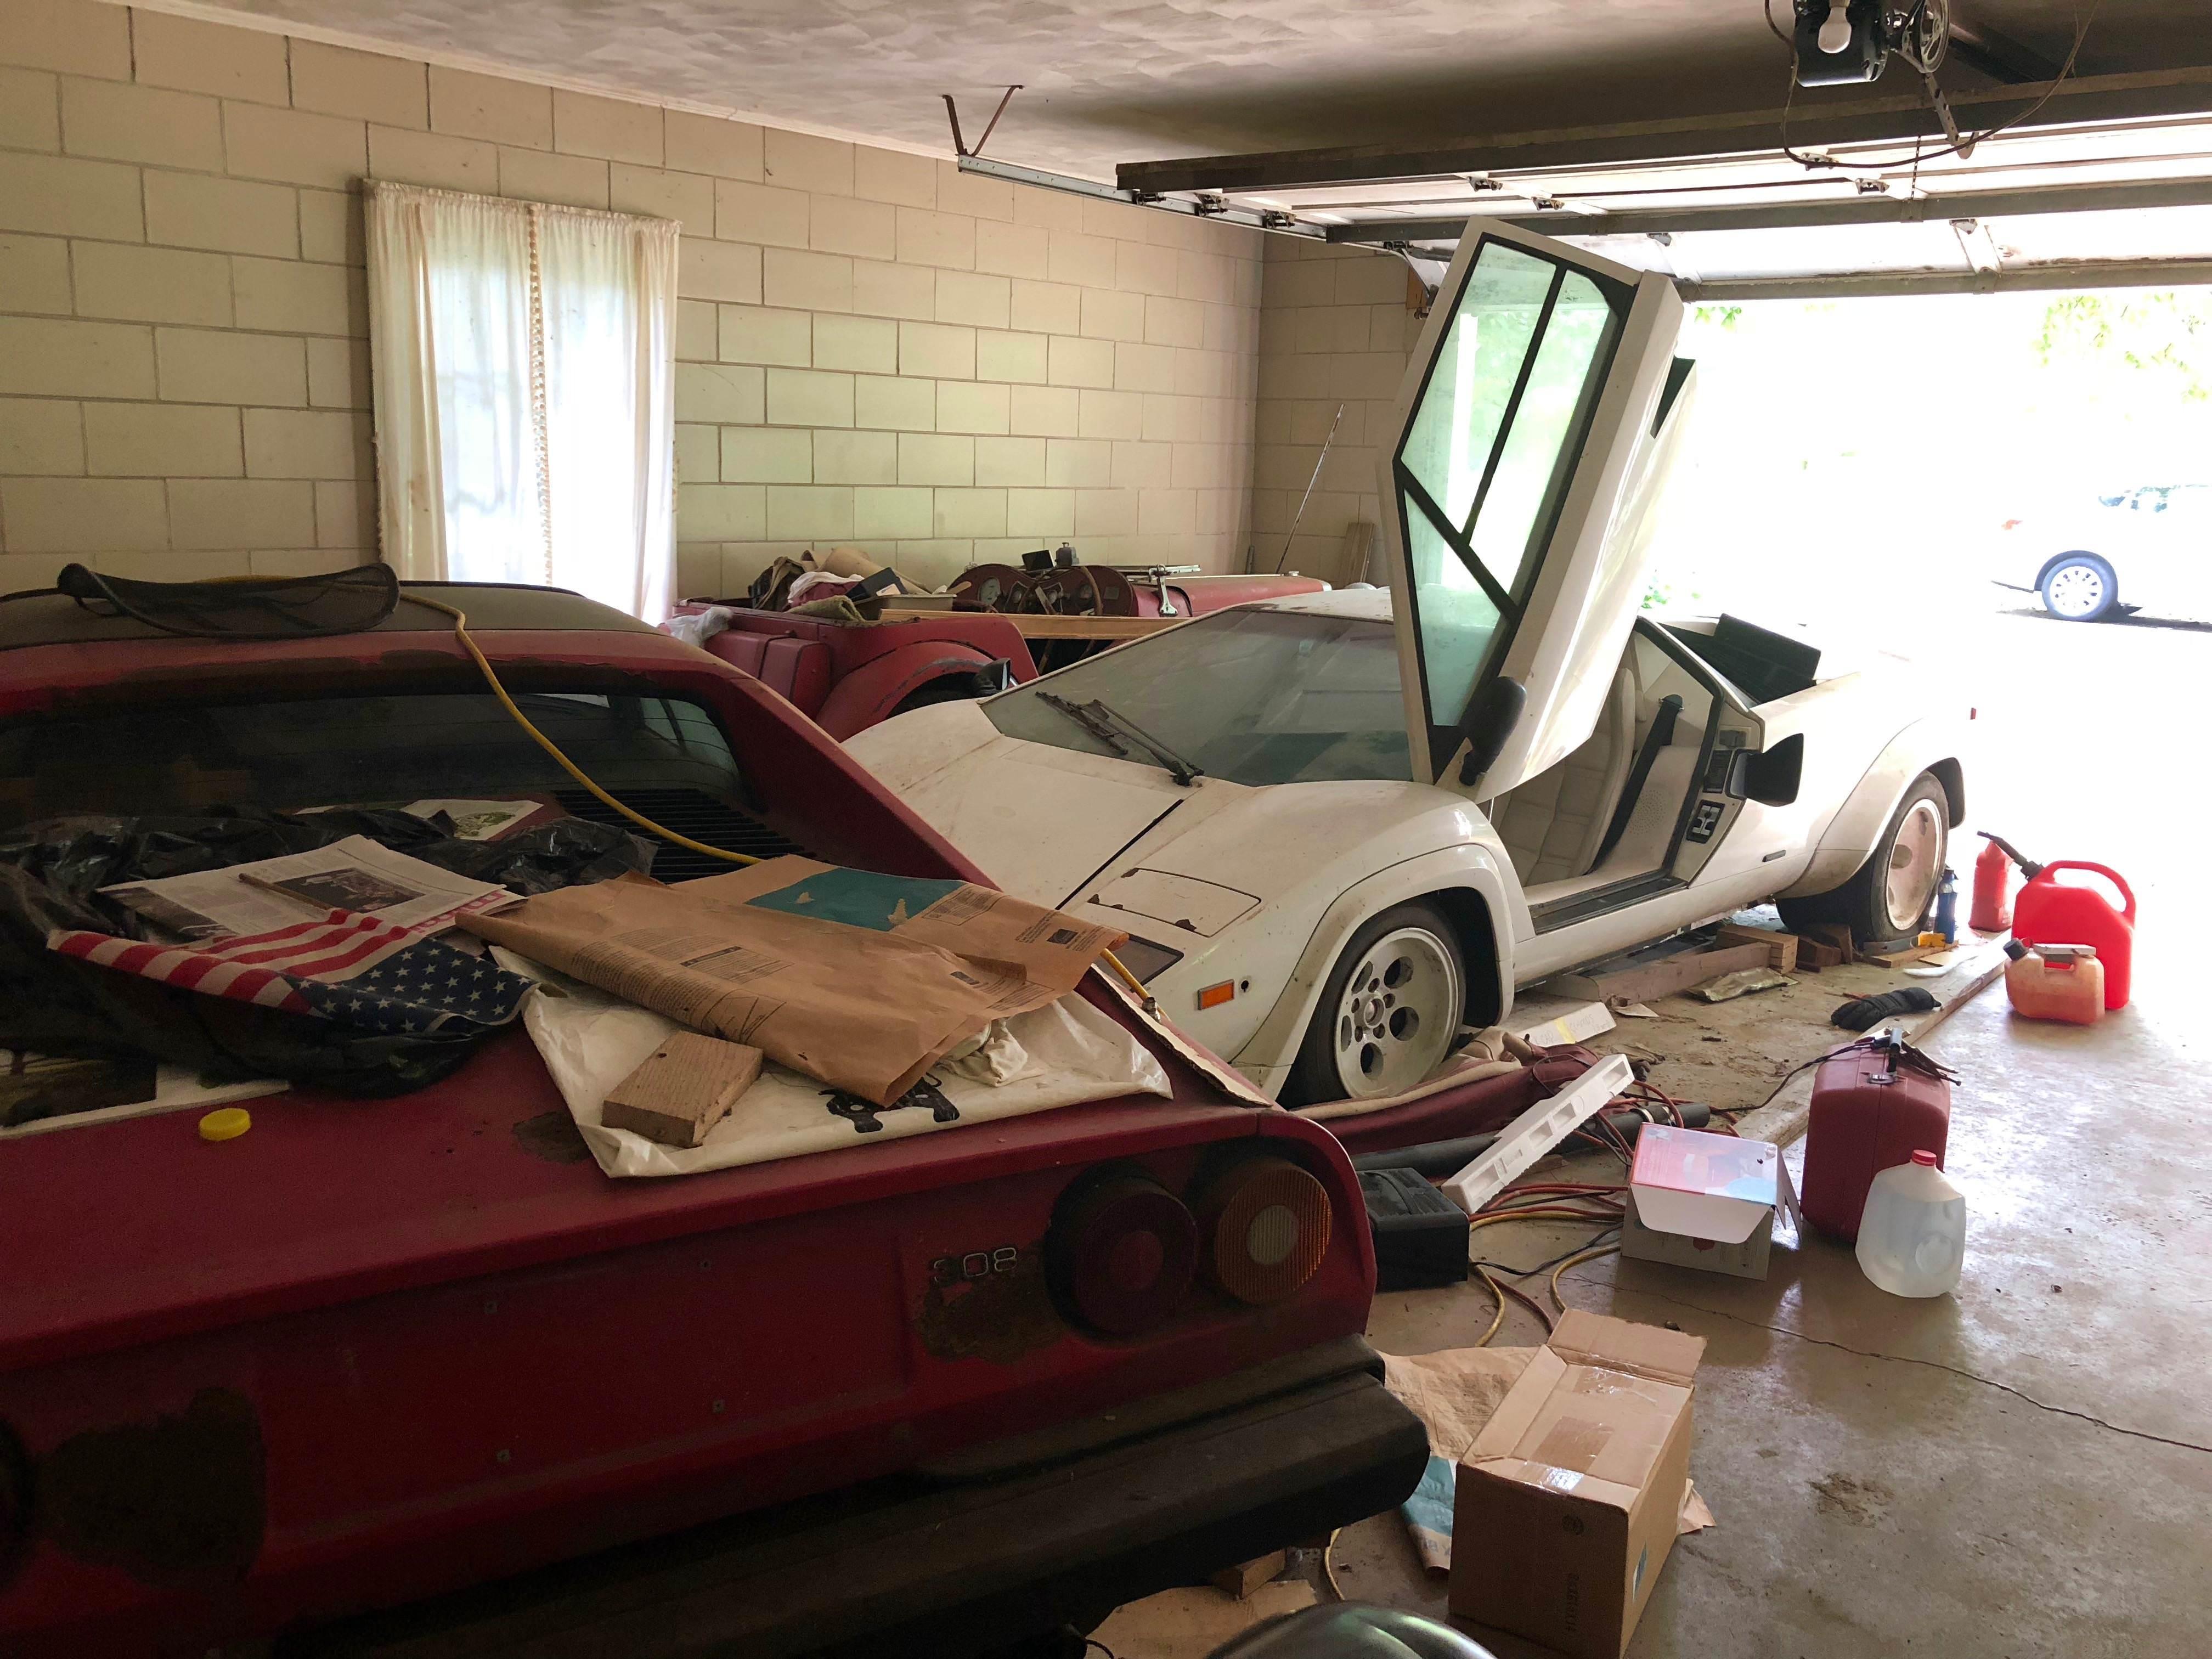 Neglected Lamborghini Countach Gathering Dust In Grandma S Garage